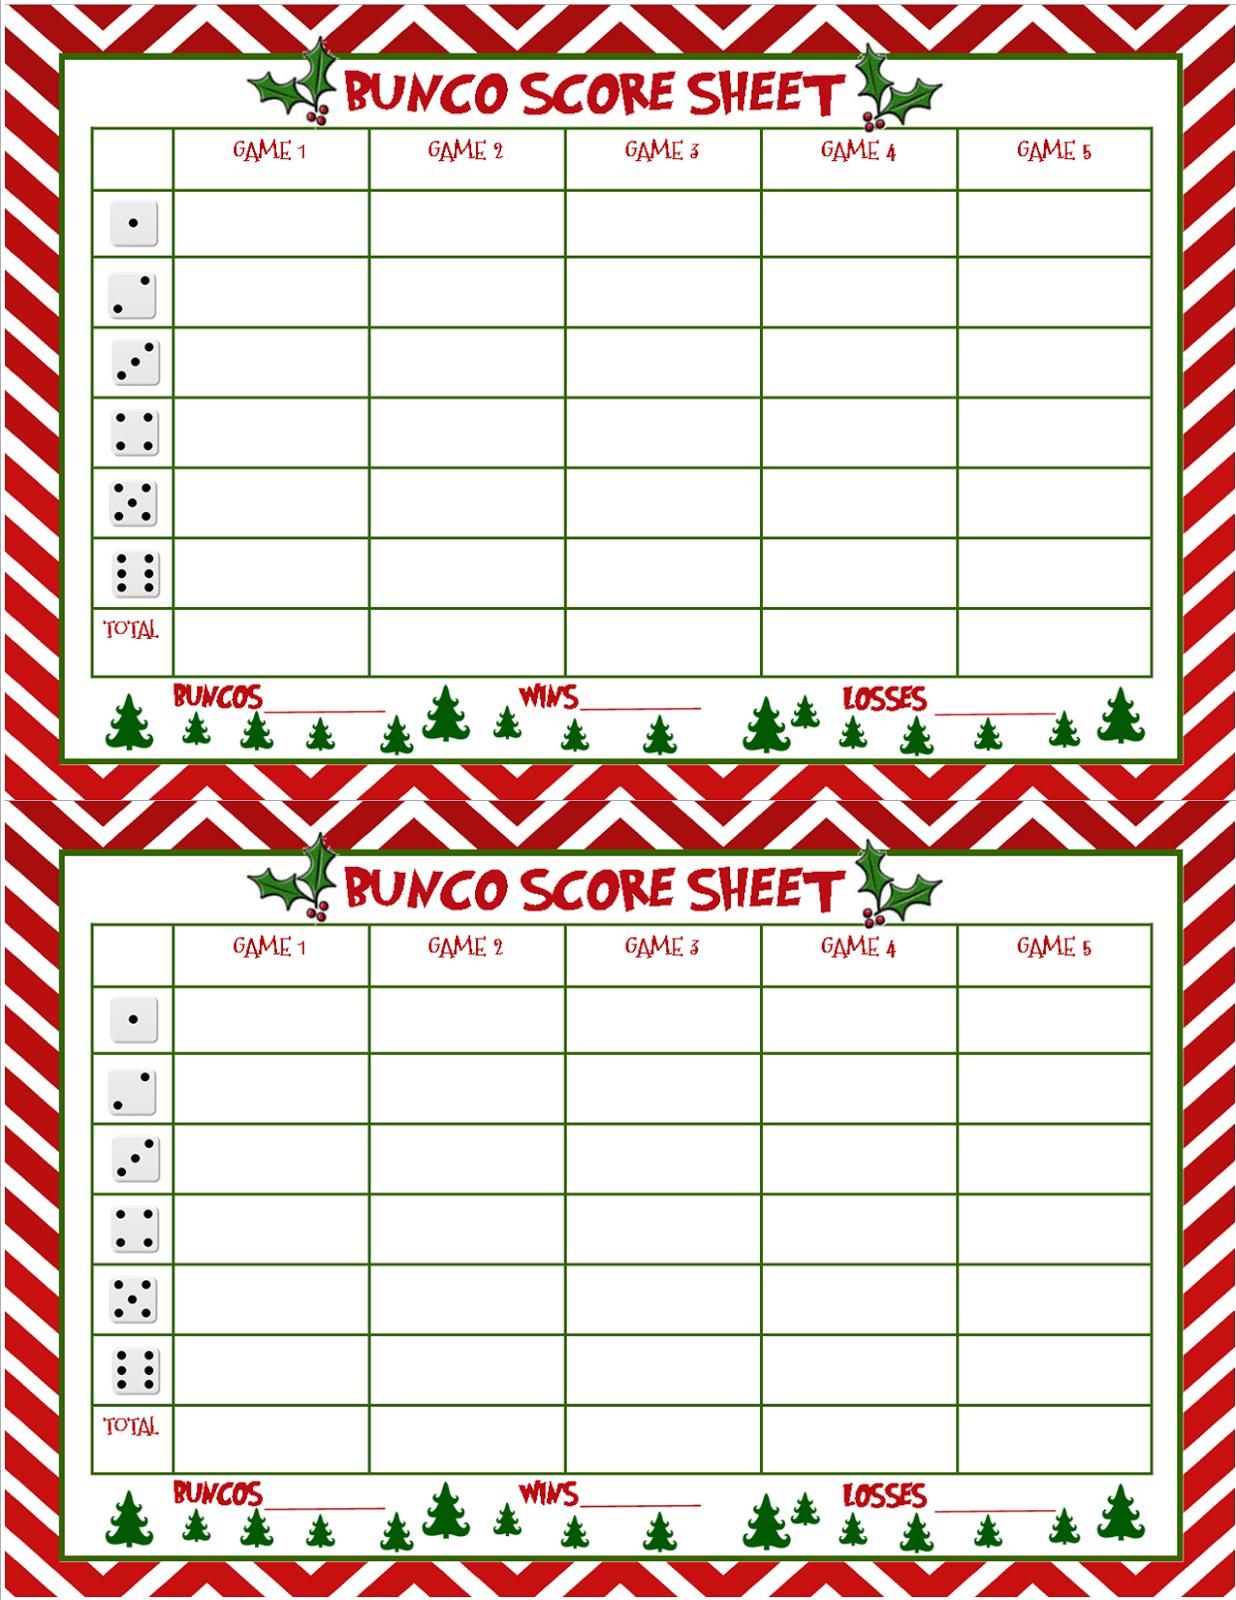 Free Printable Bunco Score Sheets Christmas – Festival Collections - Free Printable Bunco Game Sheets